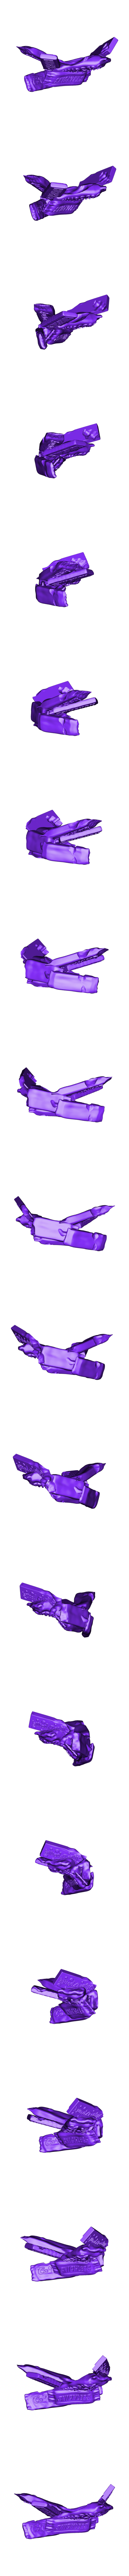 Stripe_chocolates.stl Download free STL file Stripe Gremlin • 3D printer model, 3rdesignworks